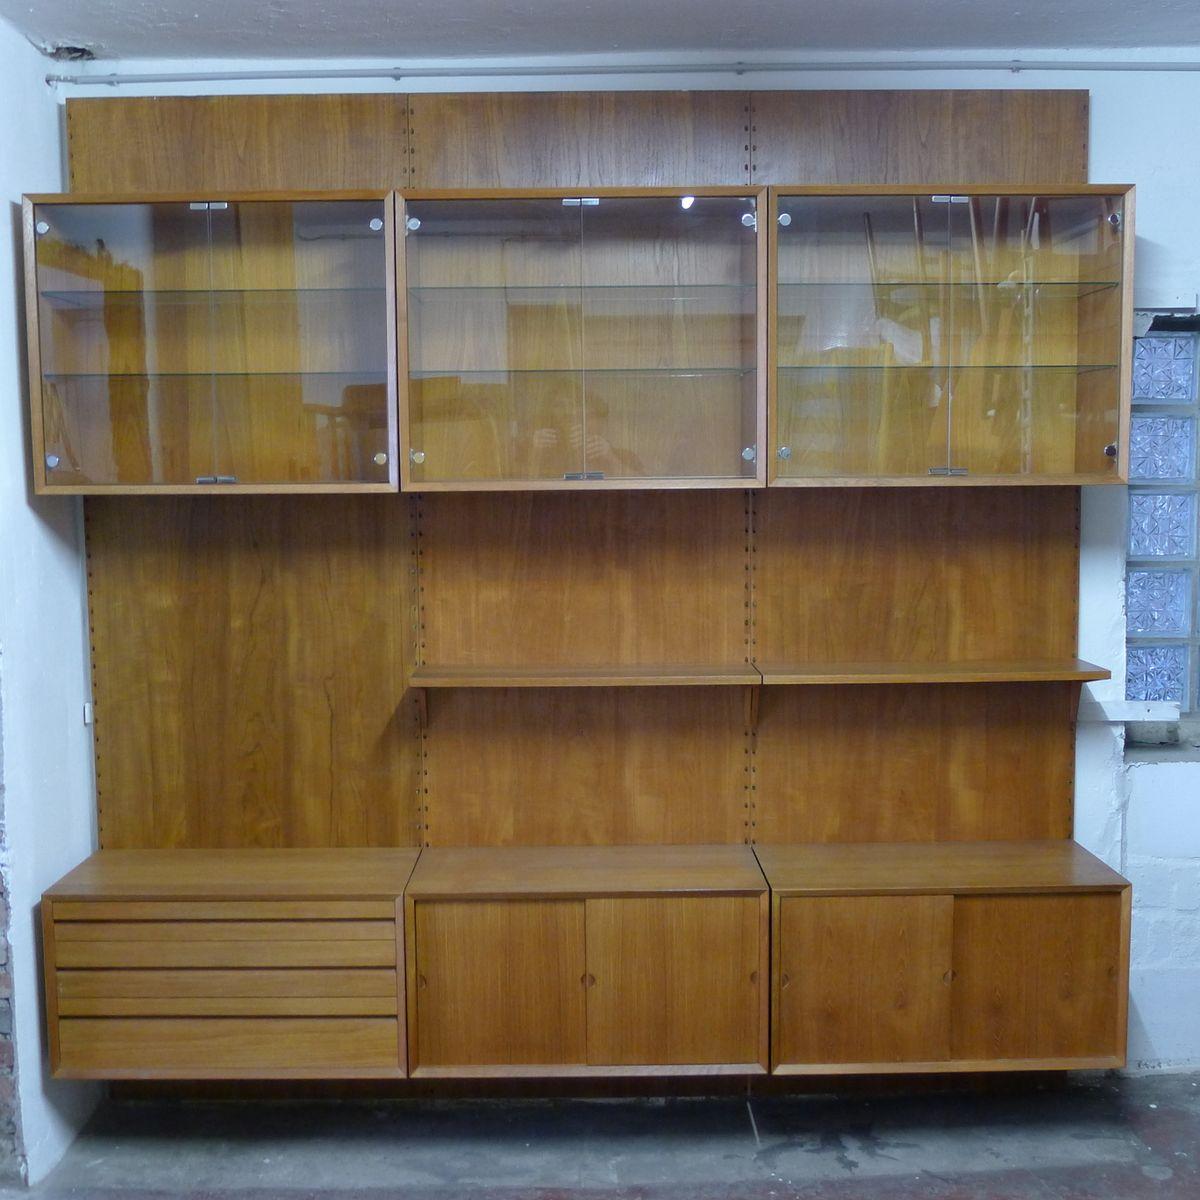 modulares mid century royal system regalsystem von poul cadovius f r cado bei pamono kaufen. Black Bedroom Furniture Sets. Home Design Ideas